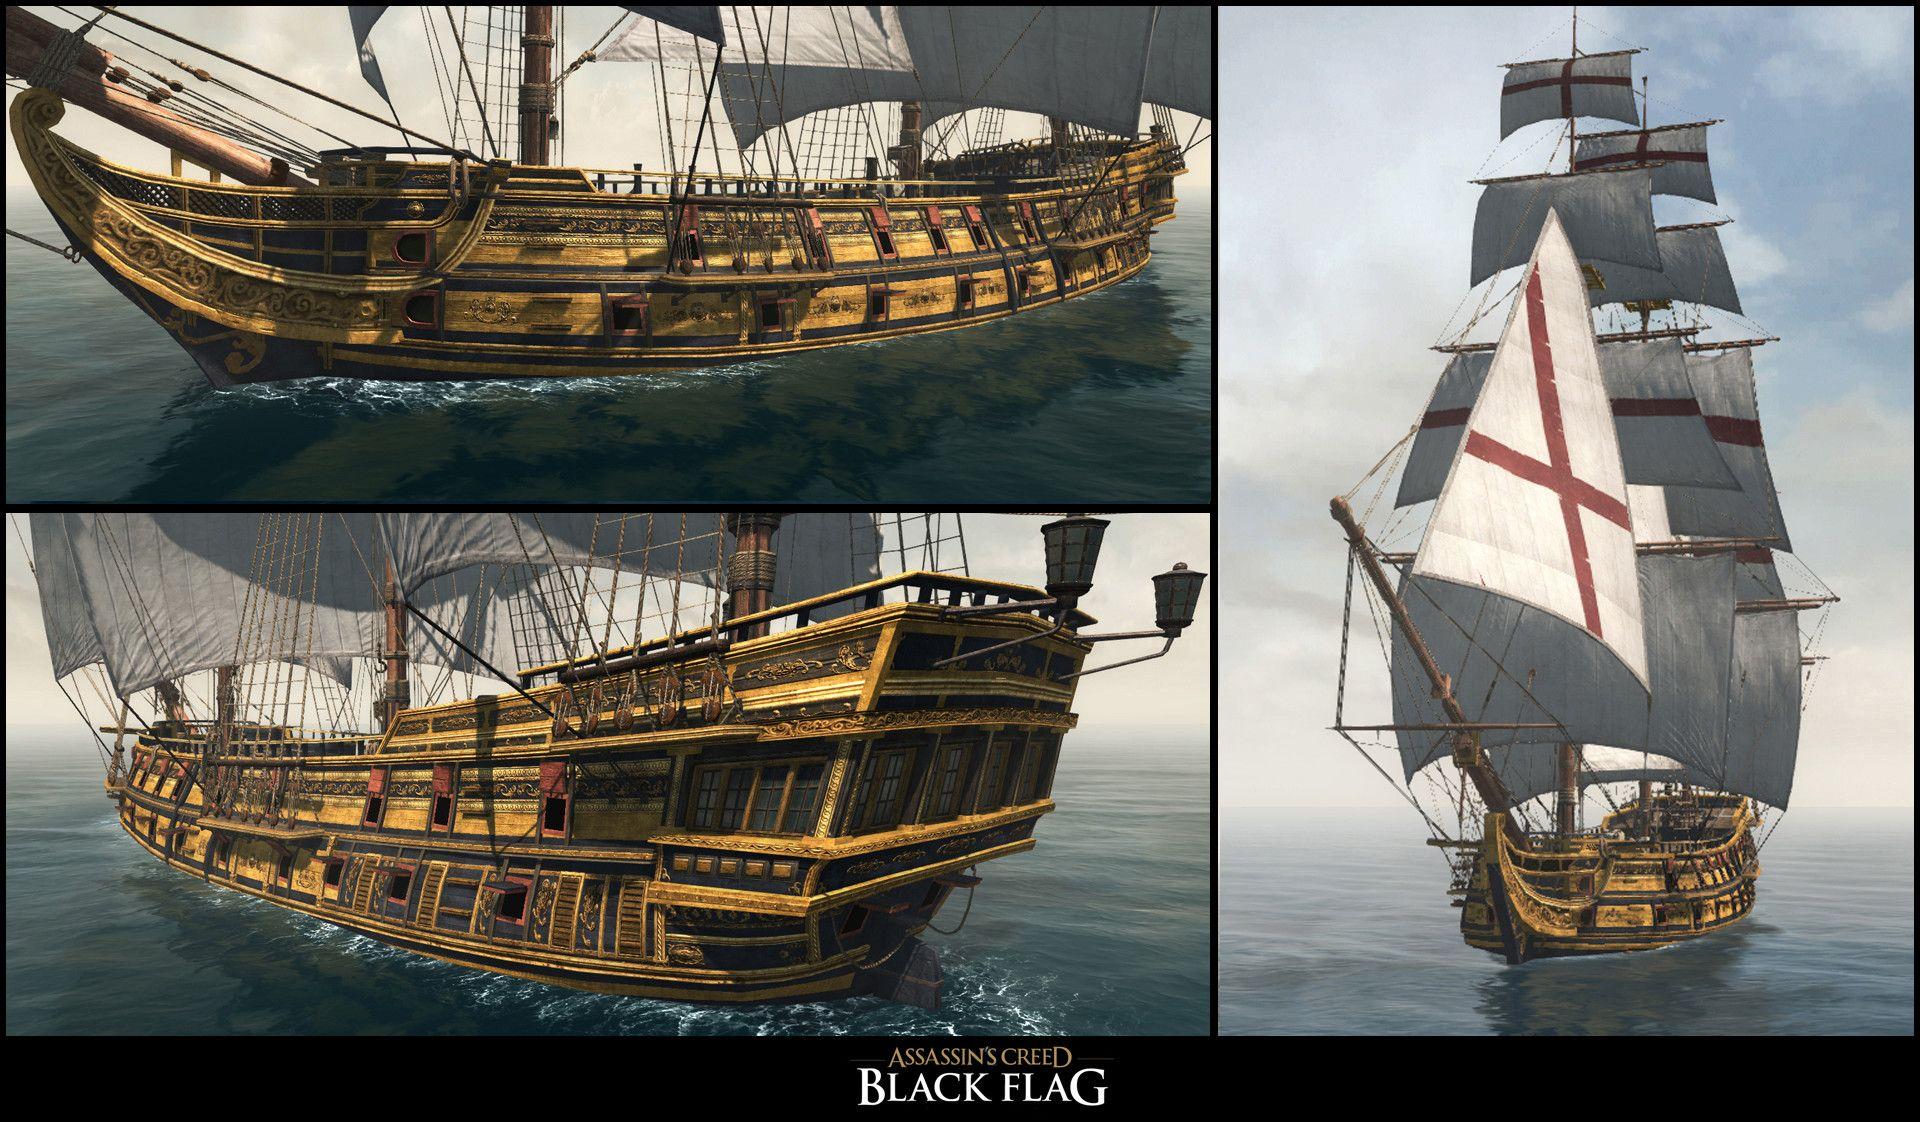 Pin By Haim Harris On Assassin S Creed Assassins Creed Black Flag Model Boats Warship